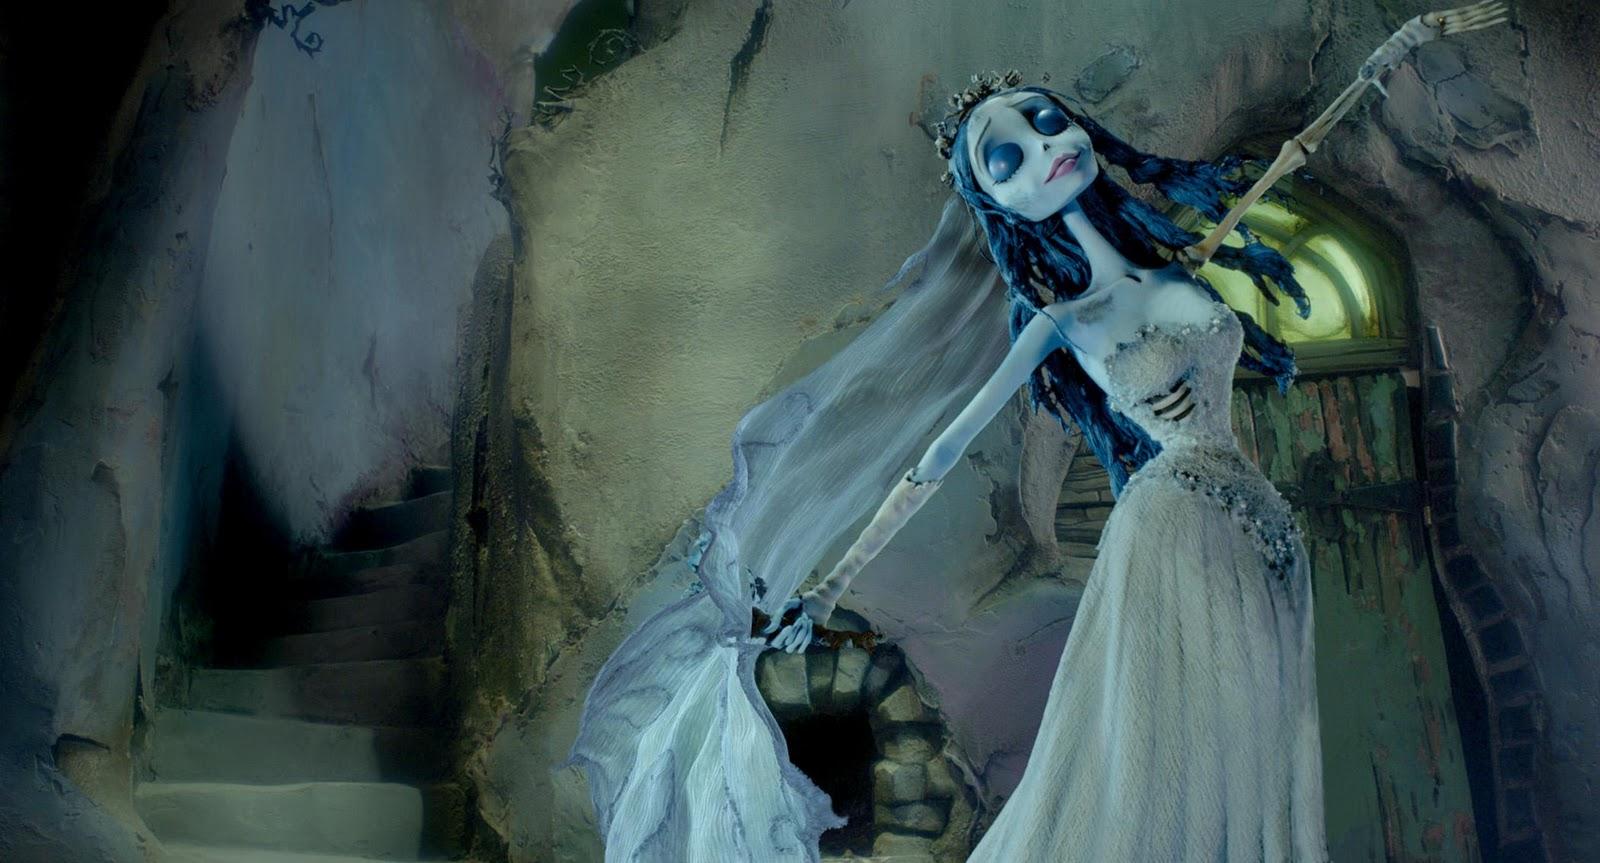 http://1.bp.blogspot.com/_miXf-wWLqEs/TL81ZQqRffI/AAAAAAAABec/V3uKHItjhuc/s1600/corpse+bride.jpg